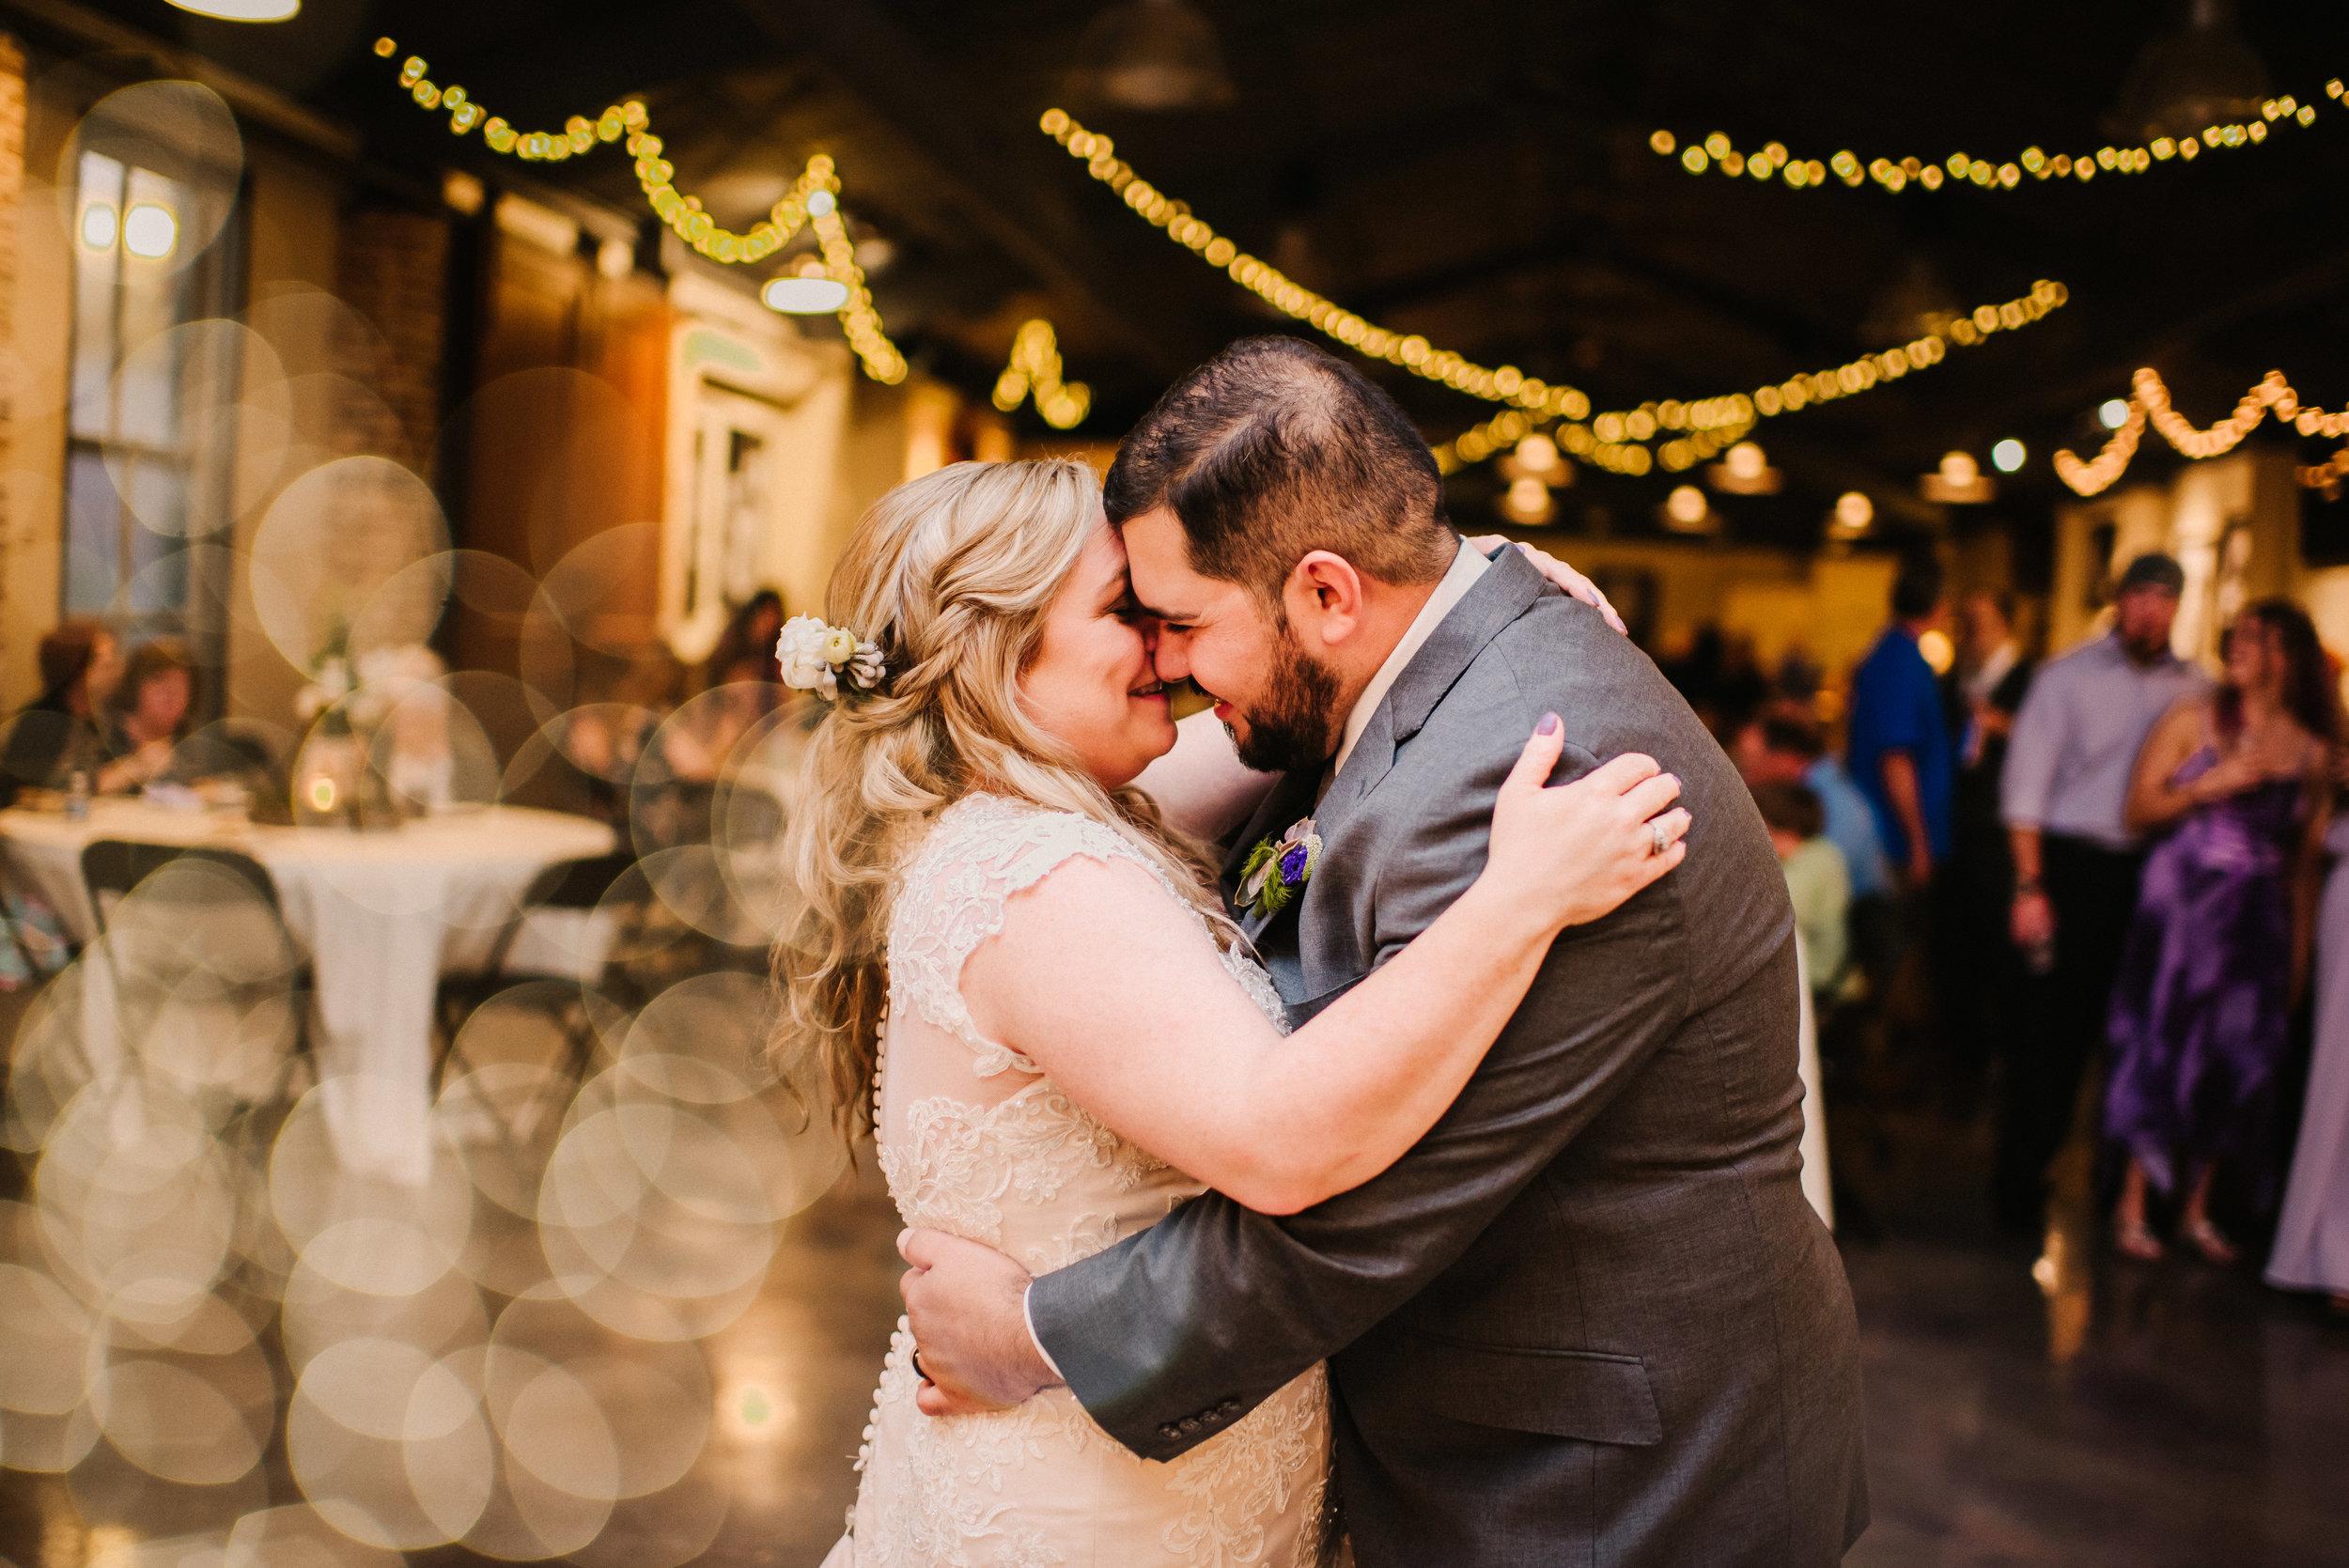 Erin & Ahmed_1 Memphis Street Wedding Hernando_Ashley Benham Photography-32.jpg